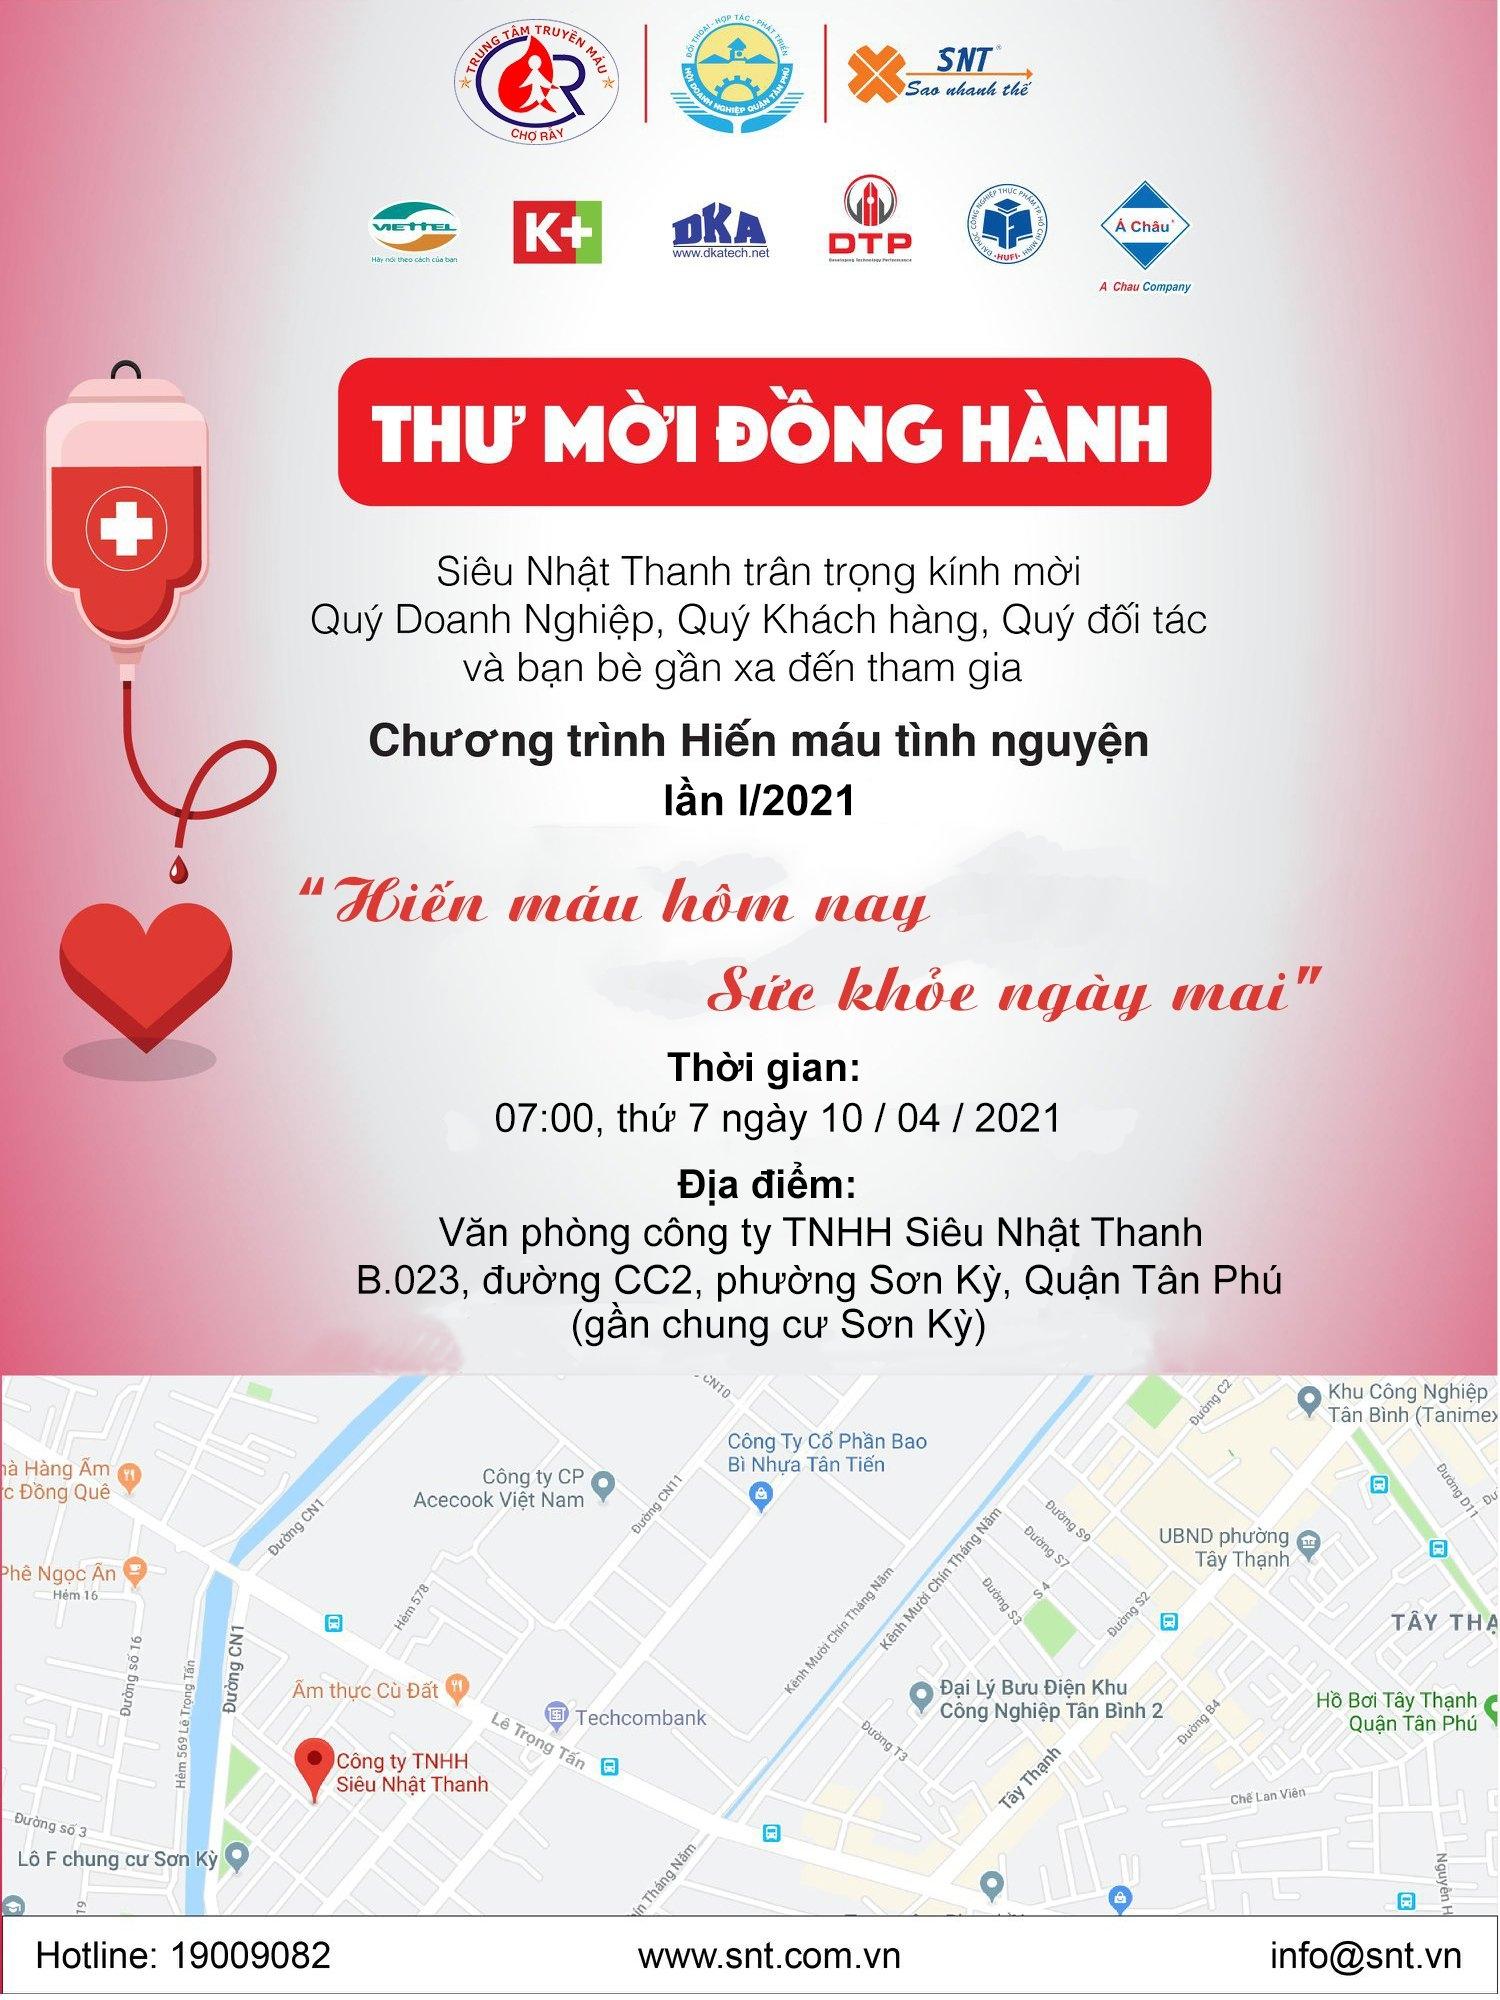 THU MOI DONG HANH